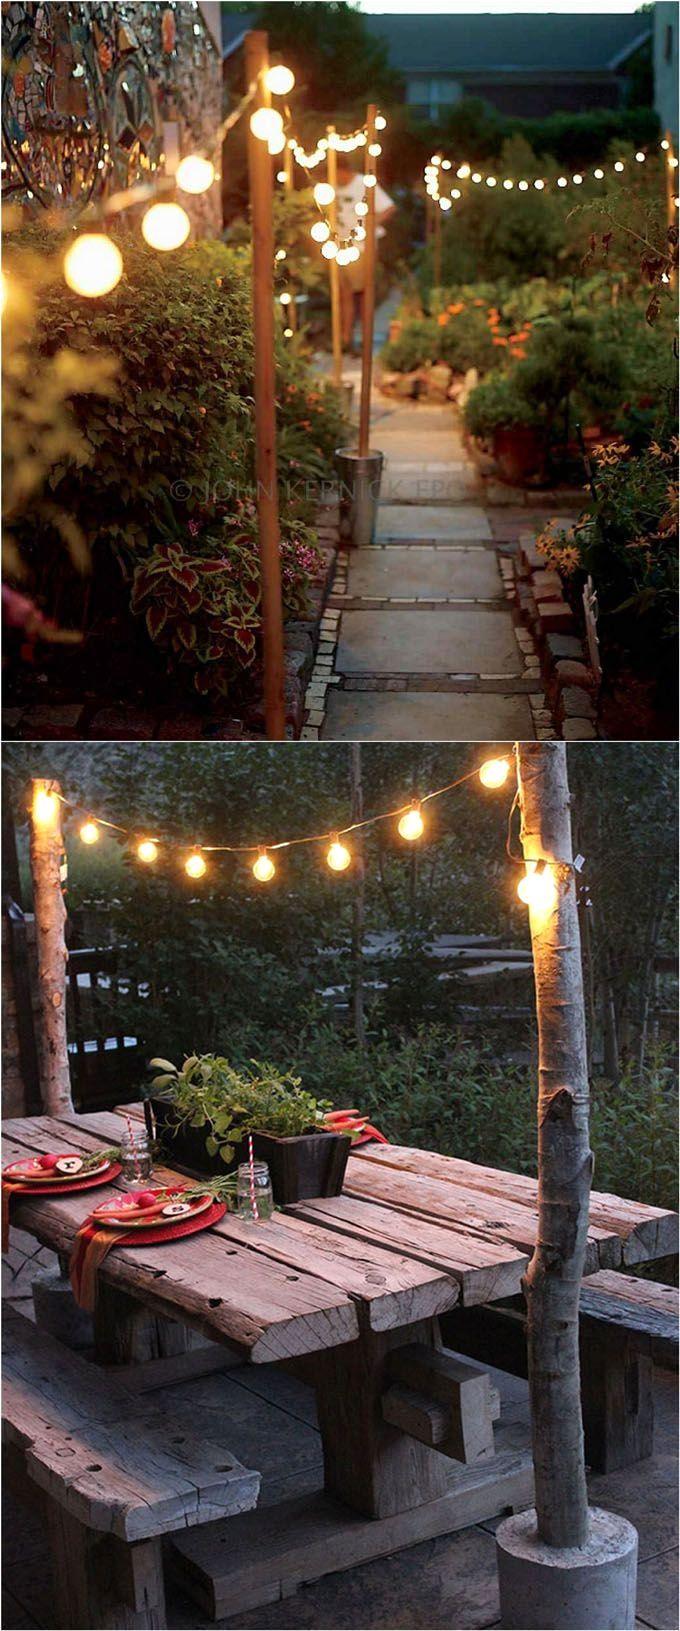 11 best outdoor space images on Pinterest   Decks, Garden ...